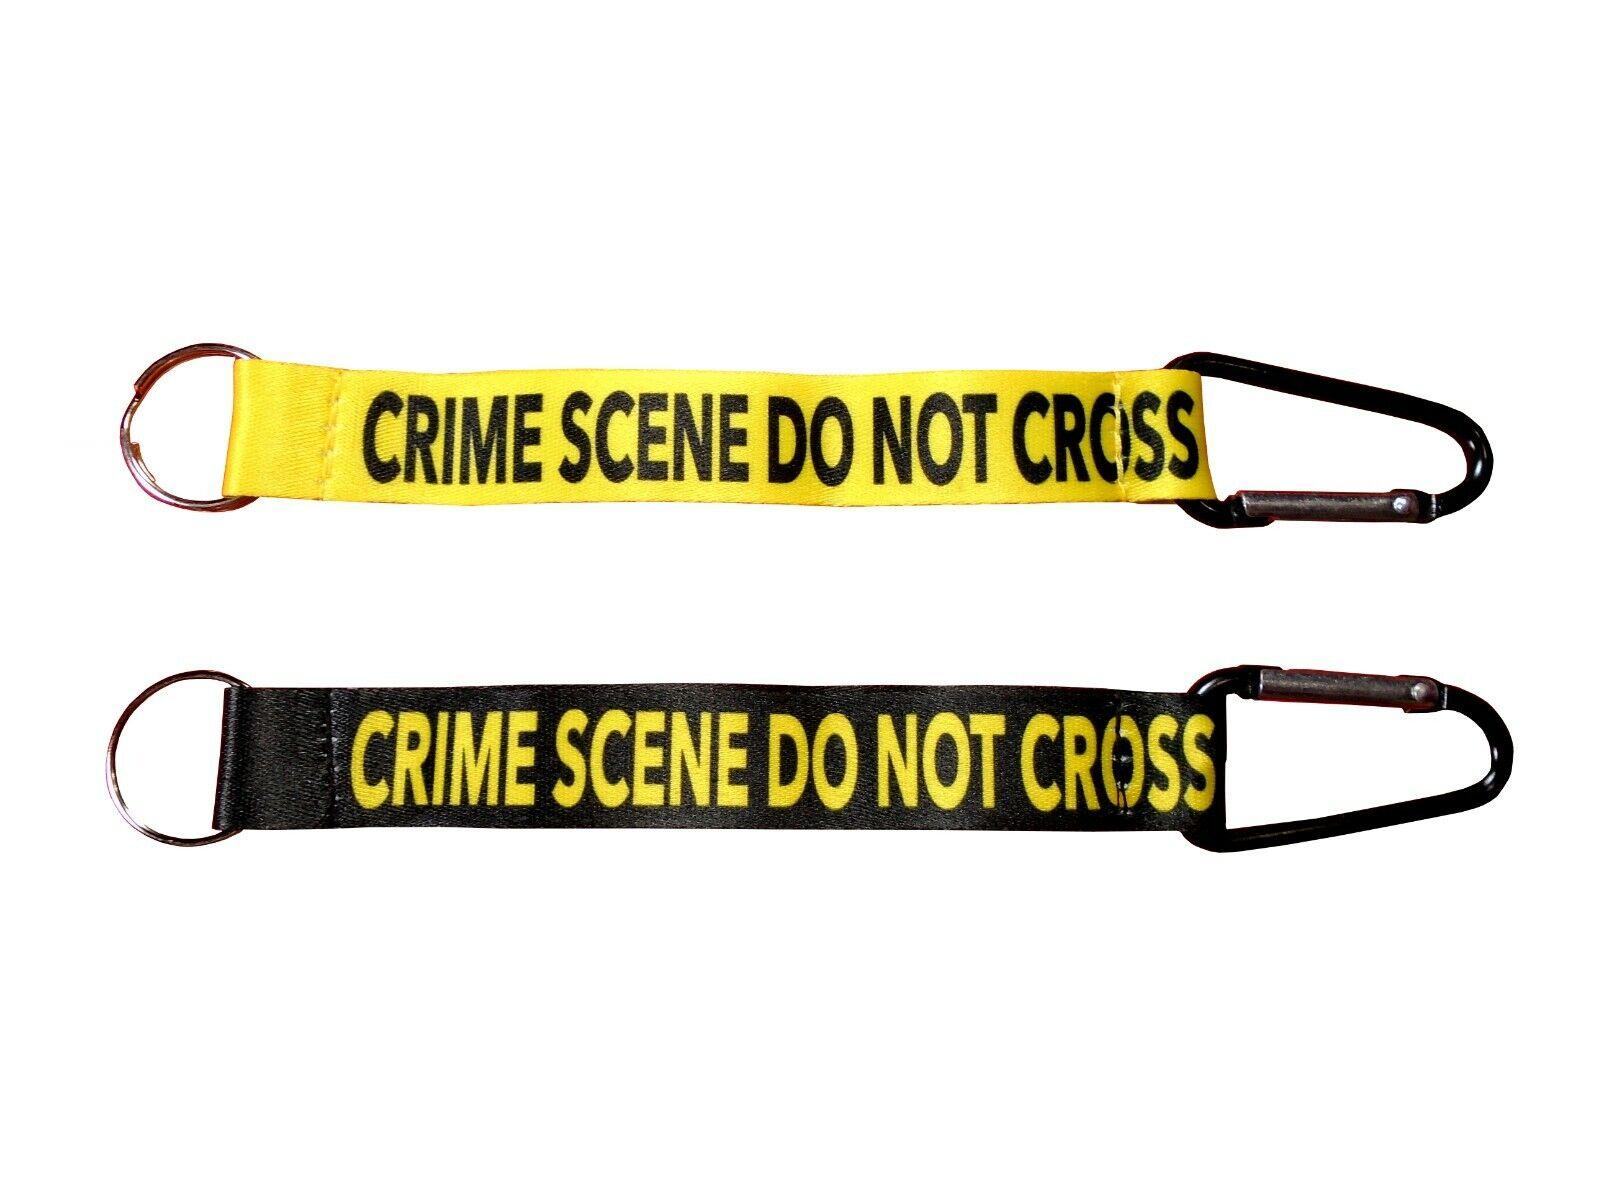 Crime Scene Do Not Cross Short Lanyard Keychain Strap with C